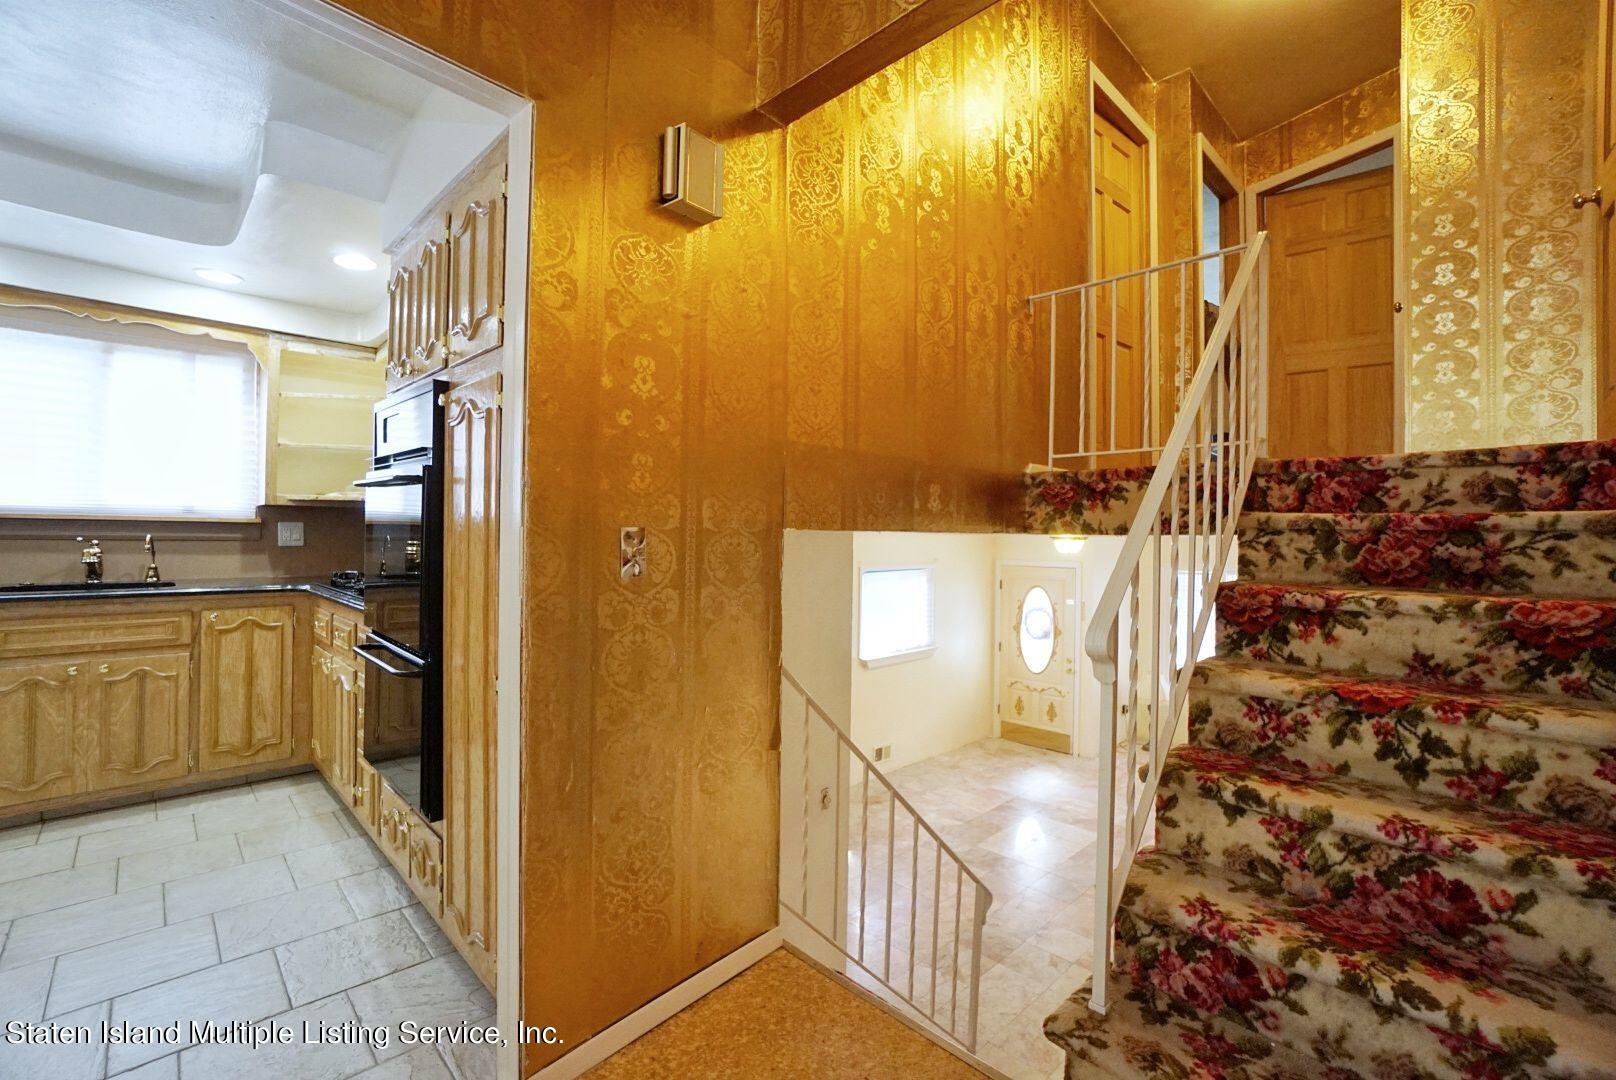 Single Family - Detached 94 Cranford Avenue  Staten Island, NY 10306, MLS-1146620-22